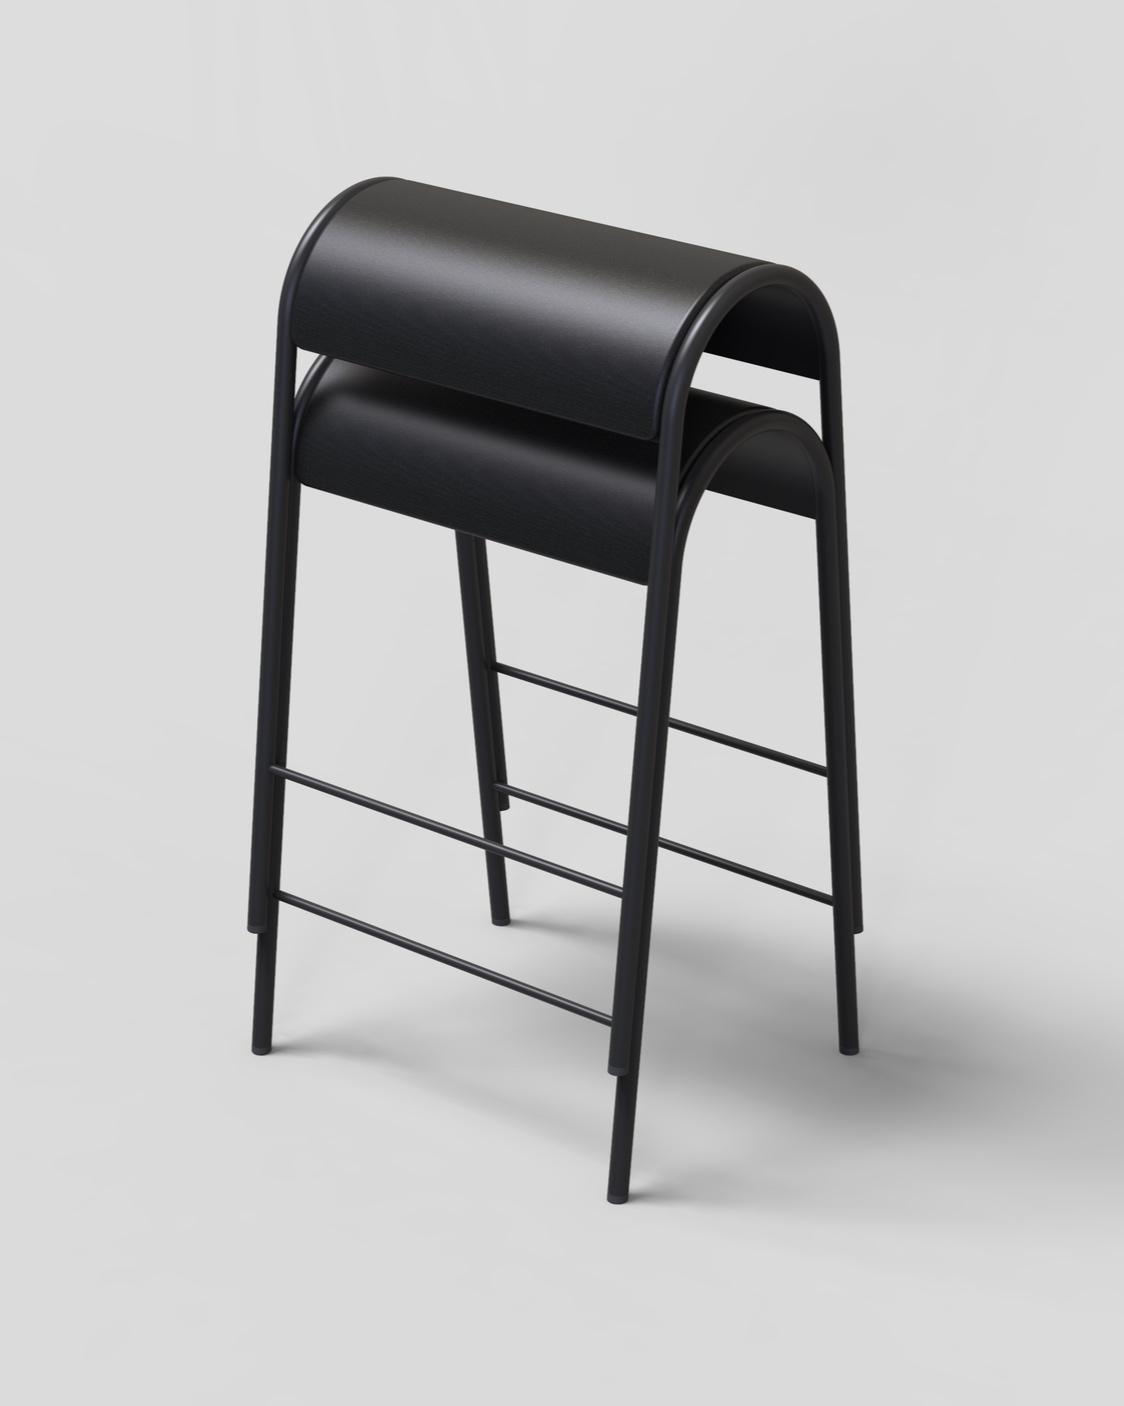 stool-ad.300.jpg